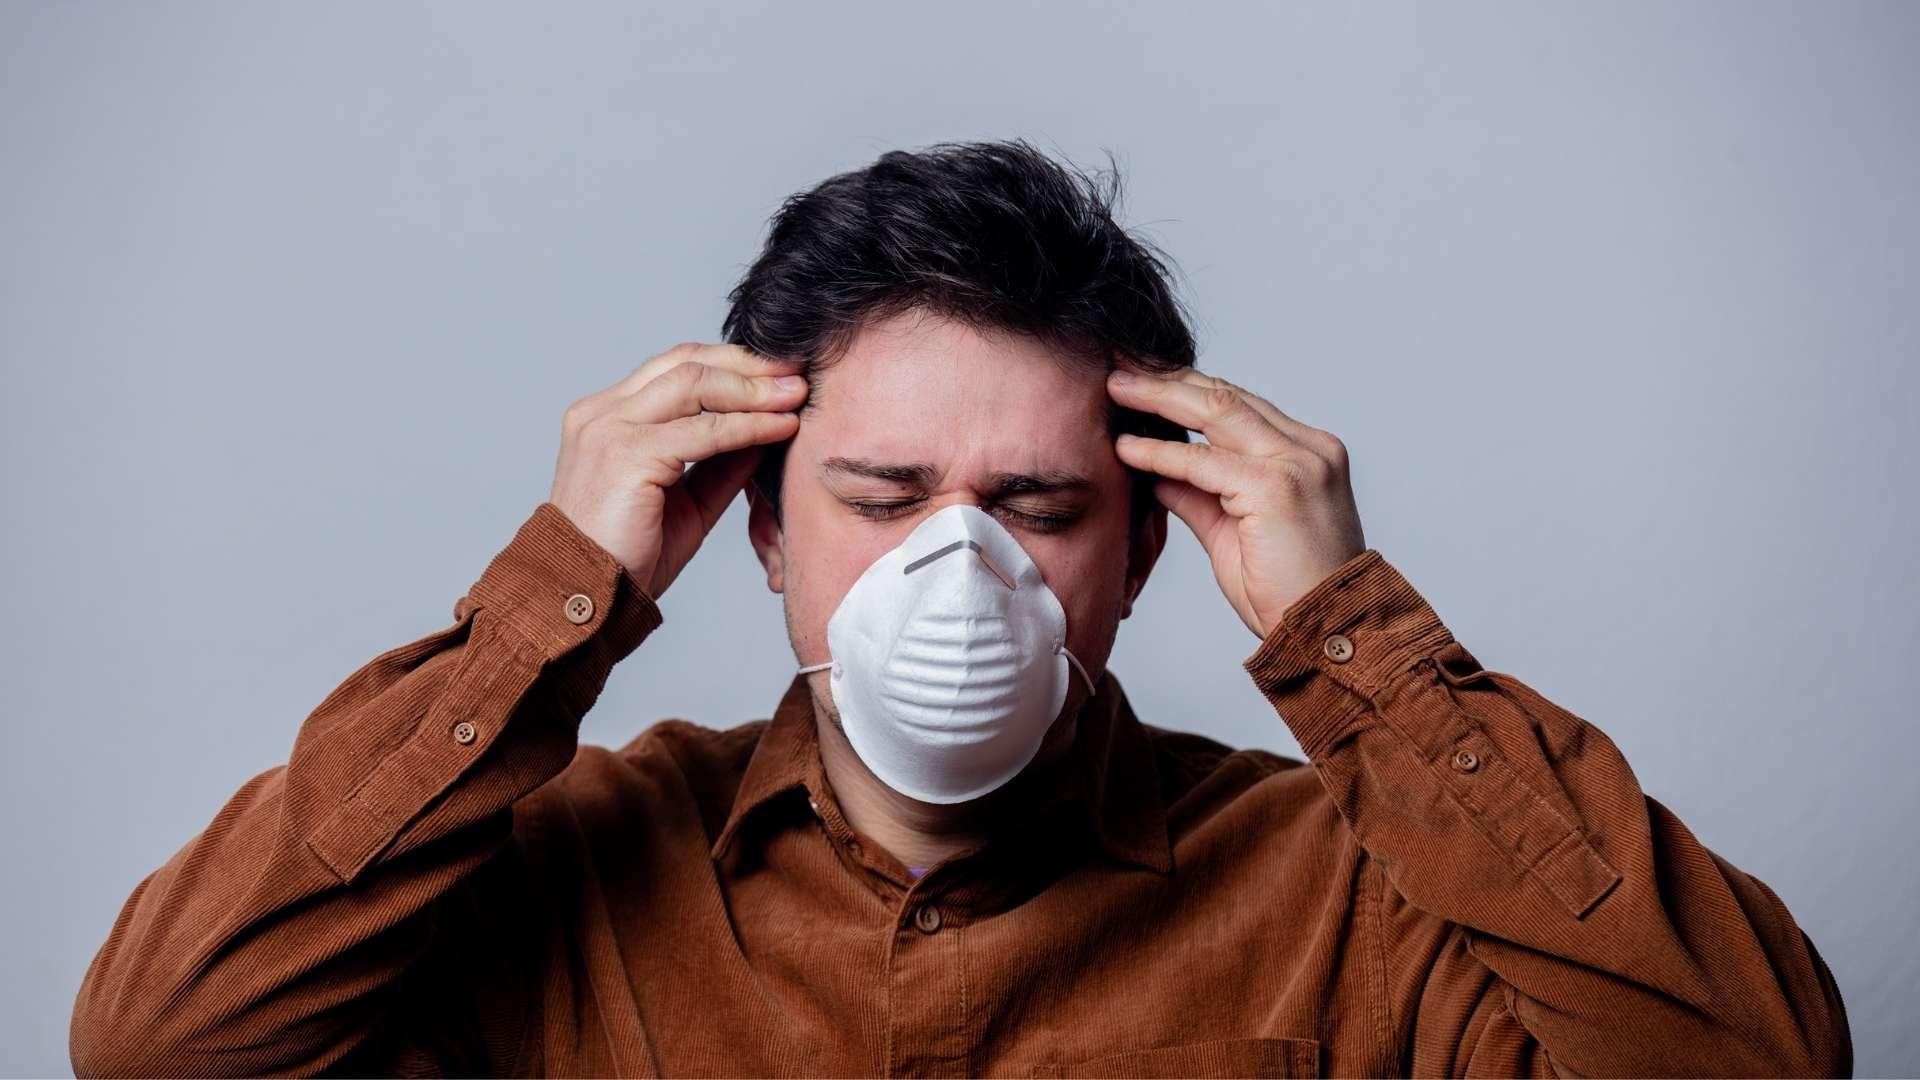 Strategi Kreatif Penanggulangan TBC di Masa Pandemi